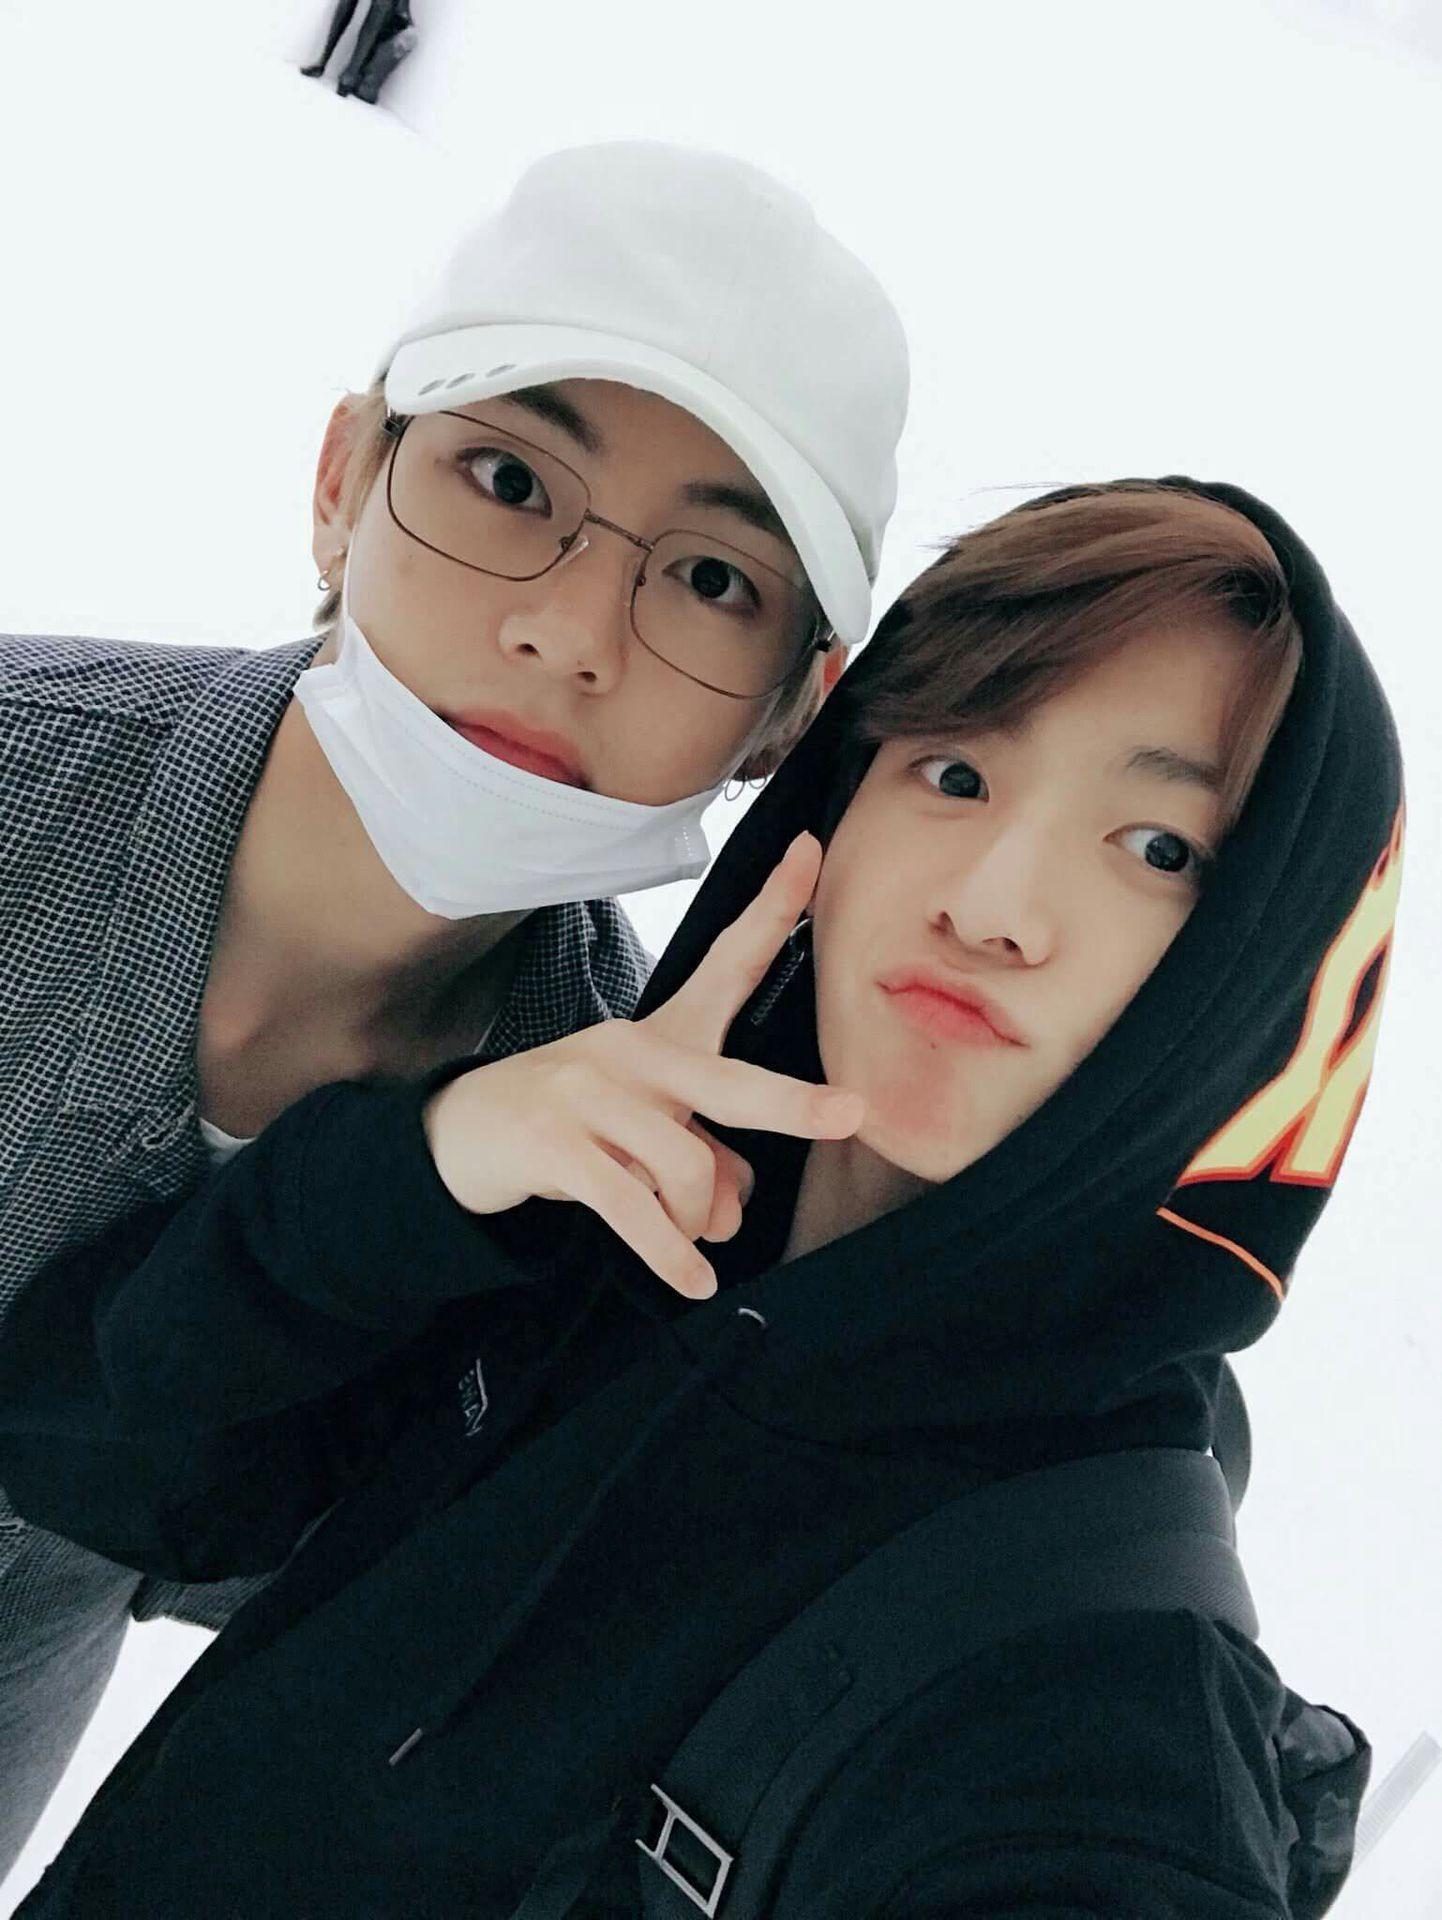 vkook in 2019 | BTS | Bts jungkook, Taehyung, Bts